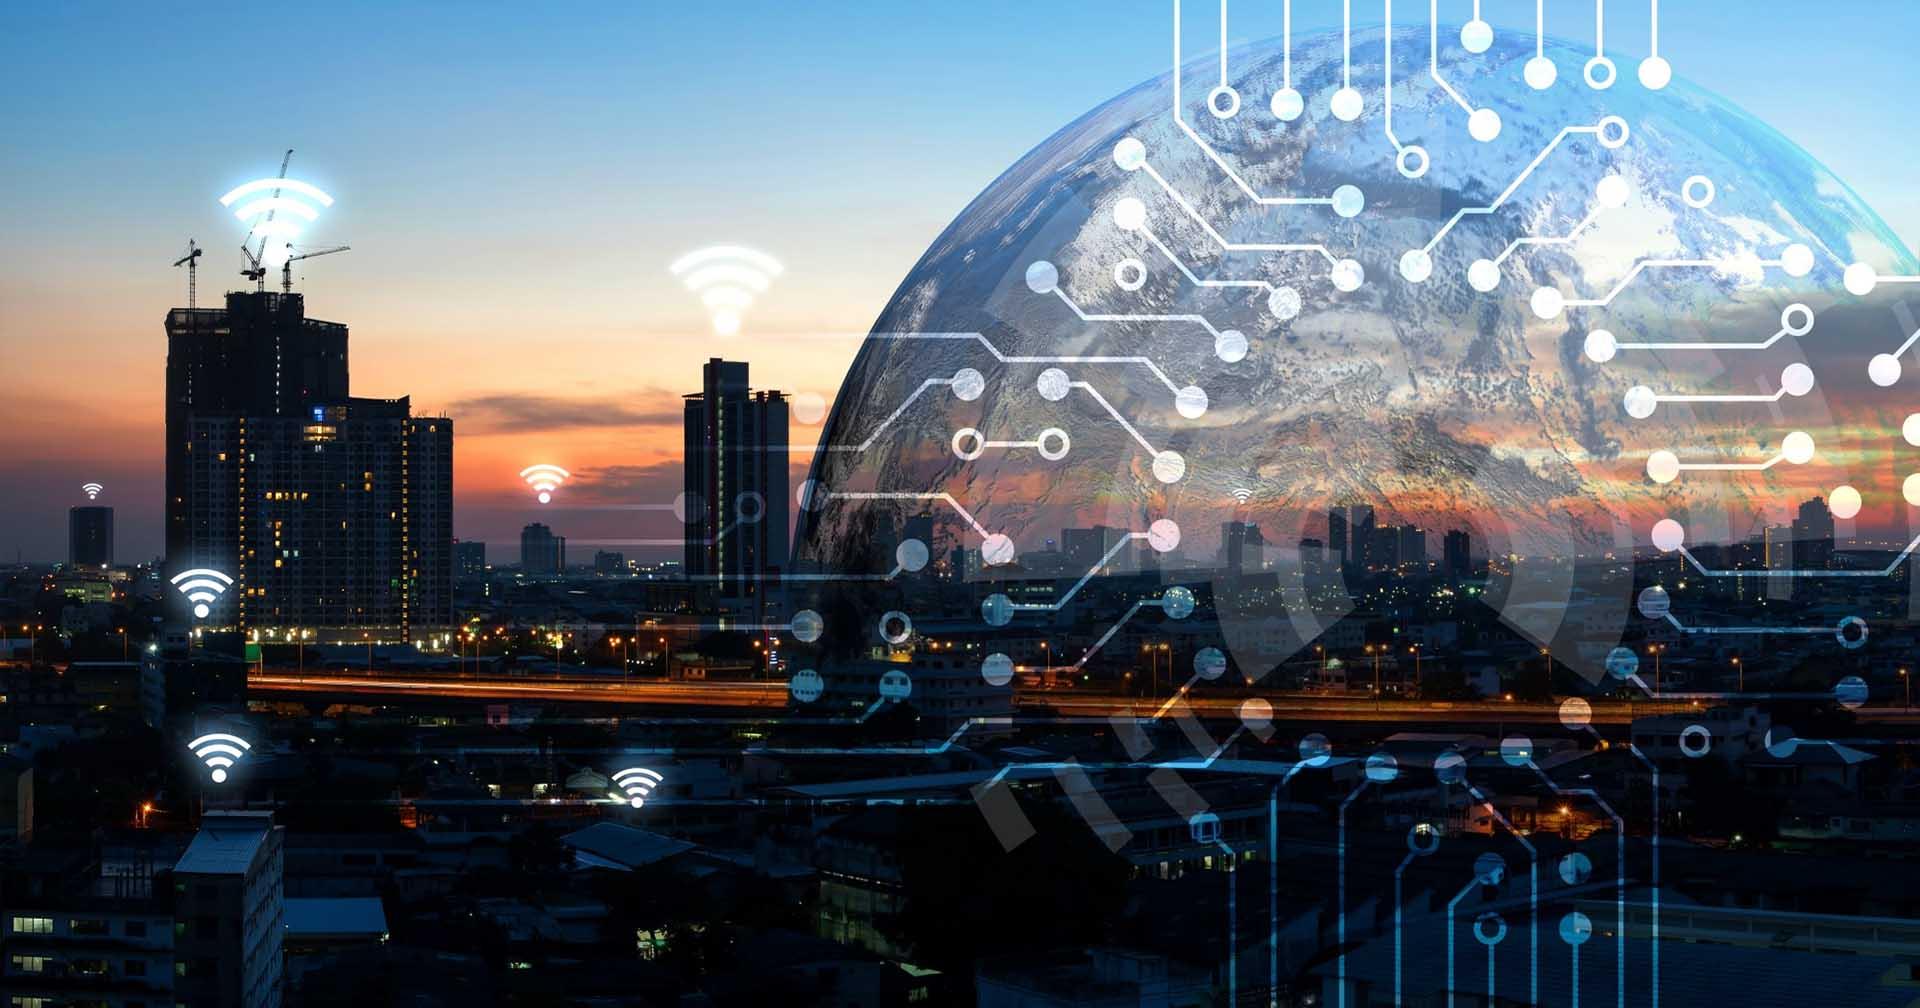 IOTA Smart City Project Granted €20 Million in EU Funding